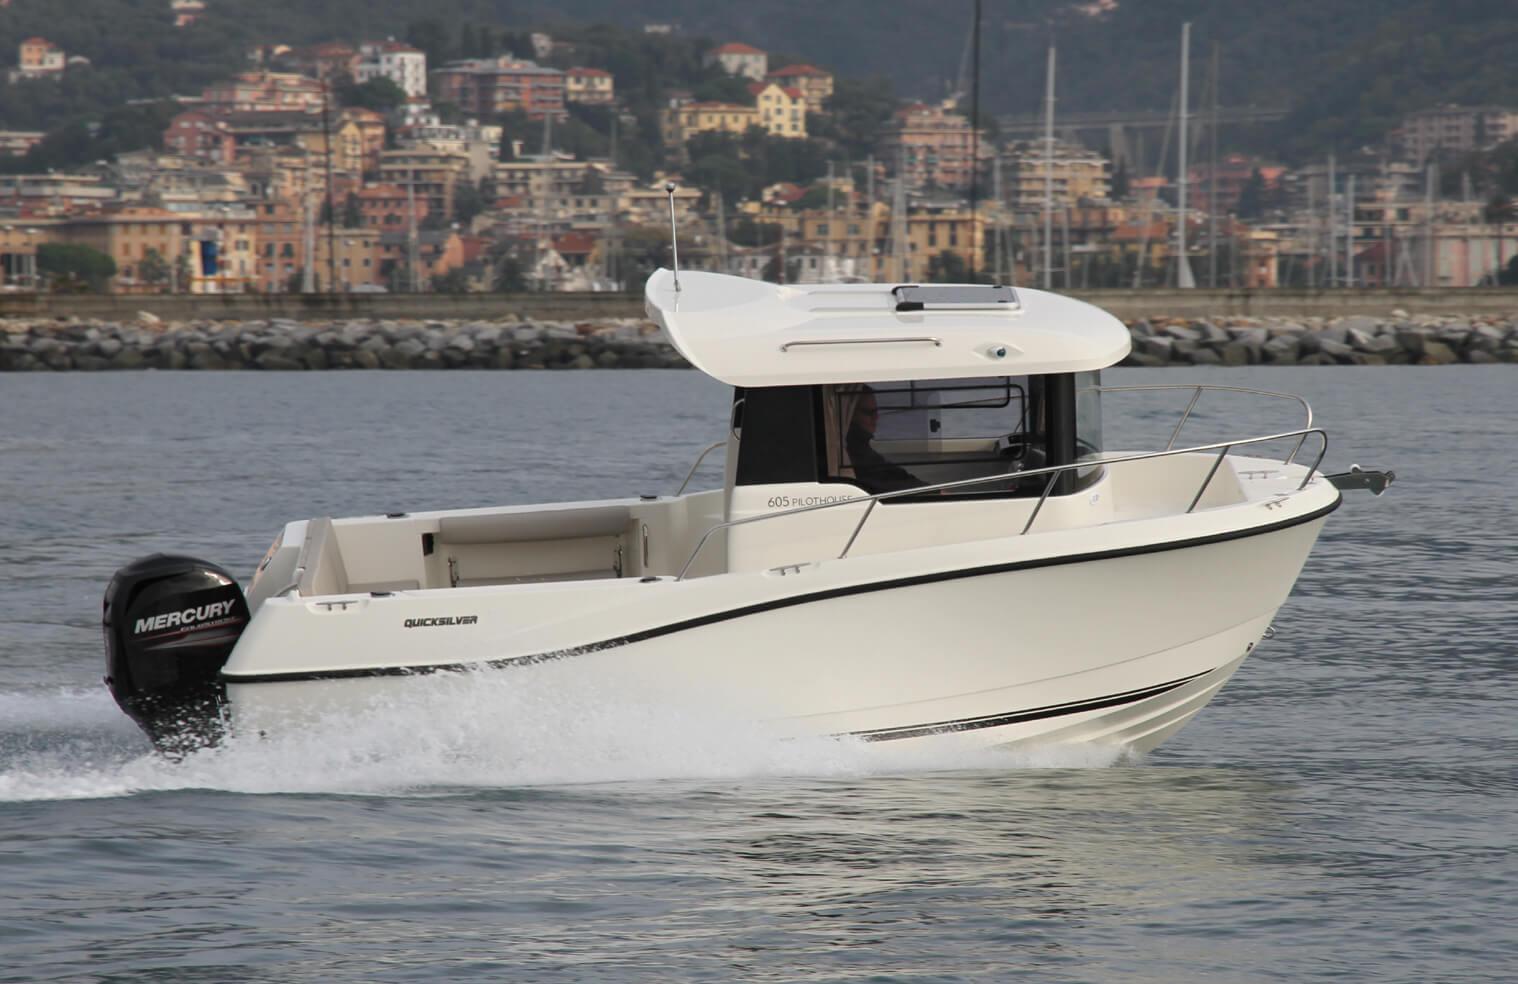 סירת דייג ספורטיבית 605-QUICKSILVER